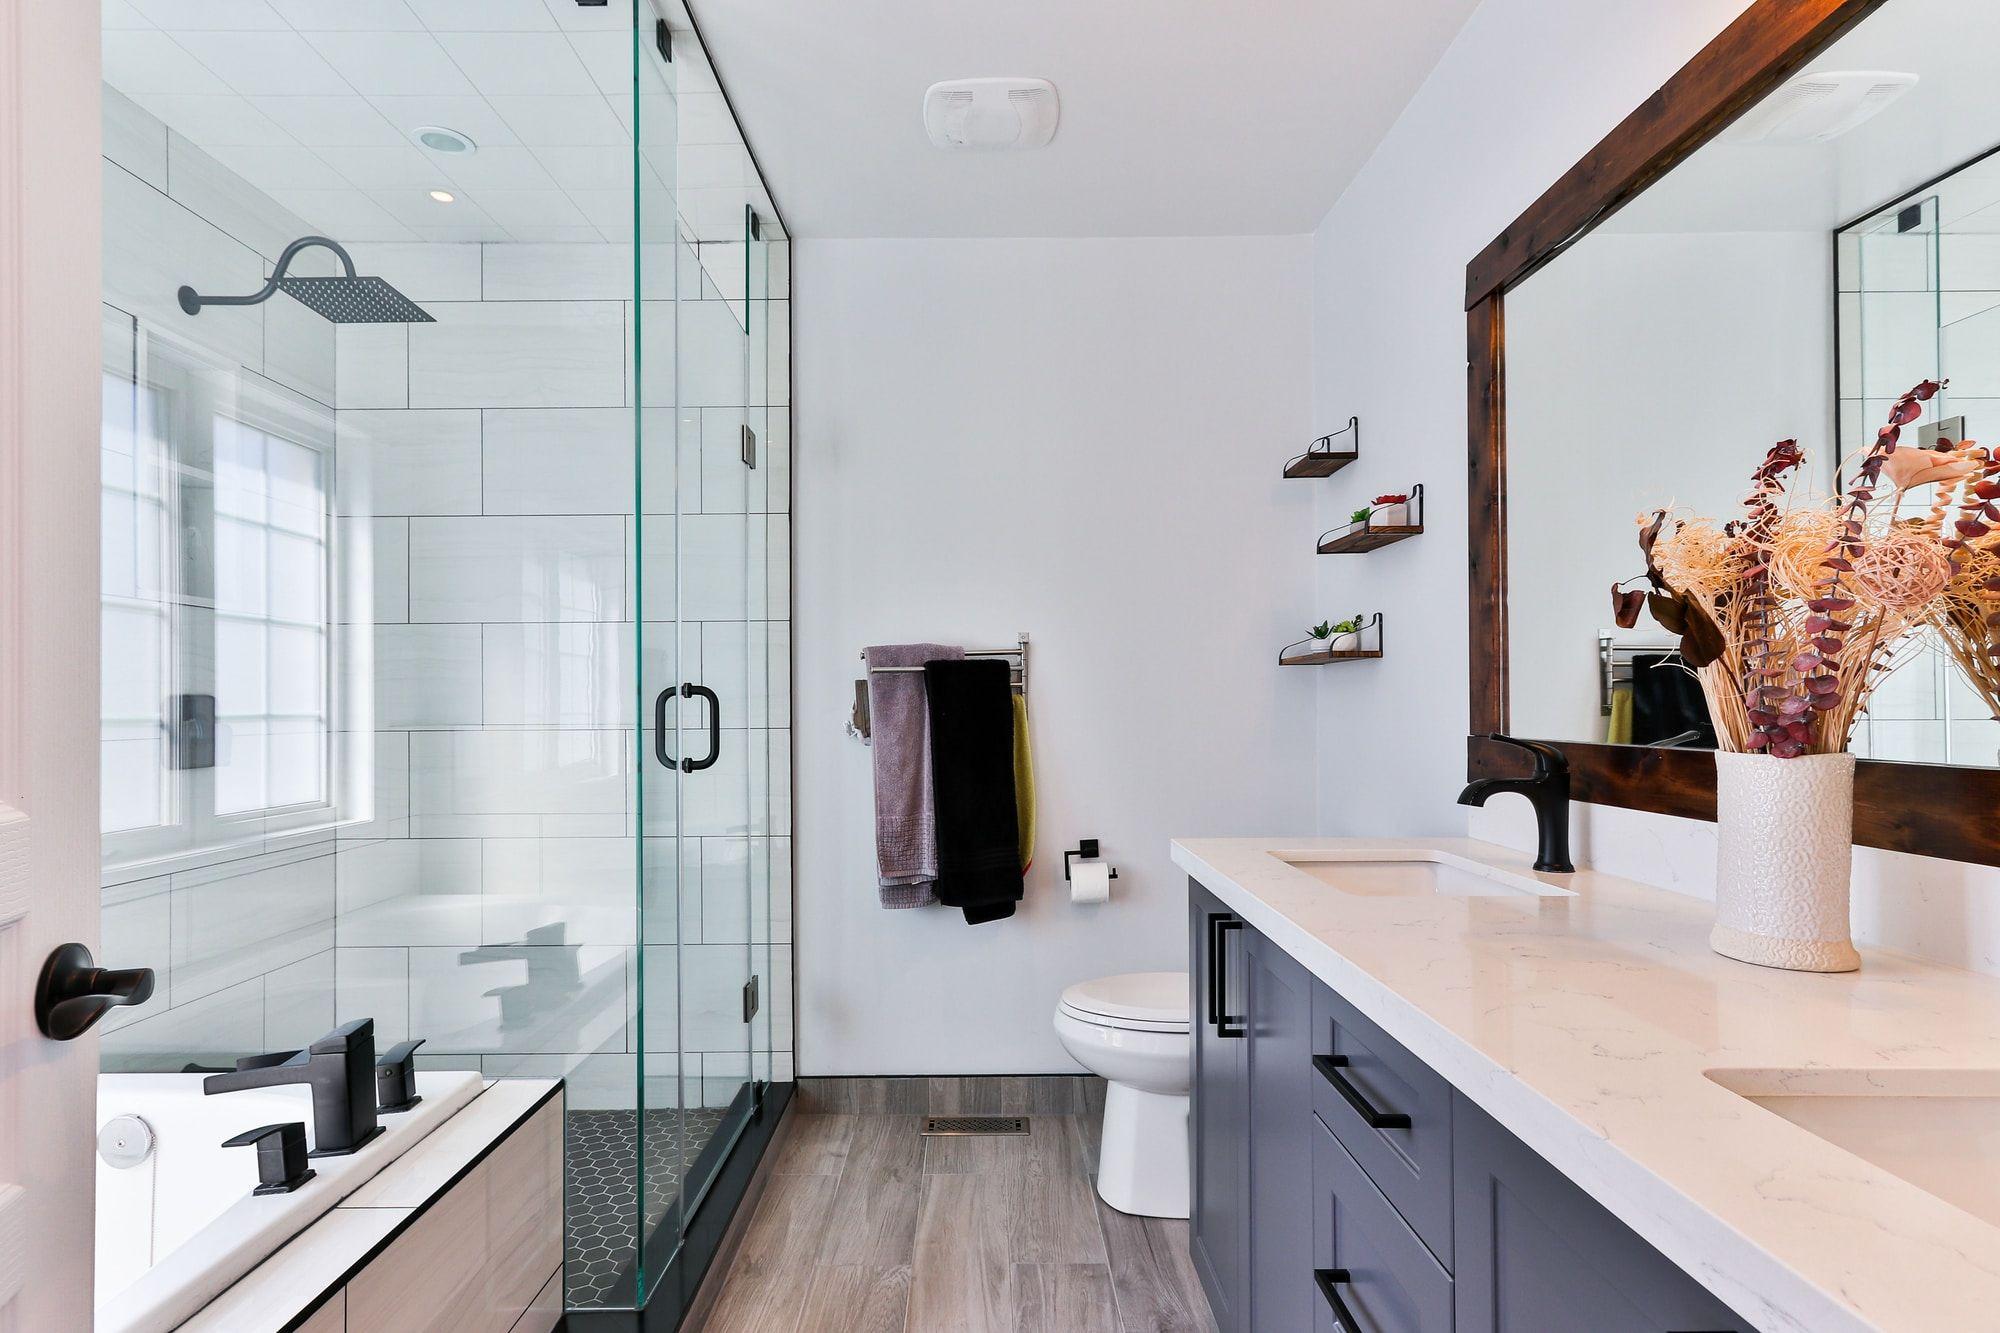 Bathroom Renovations in Mandurah With Peel Property Solutions